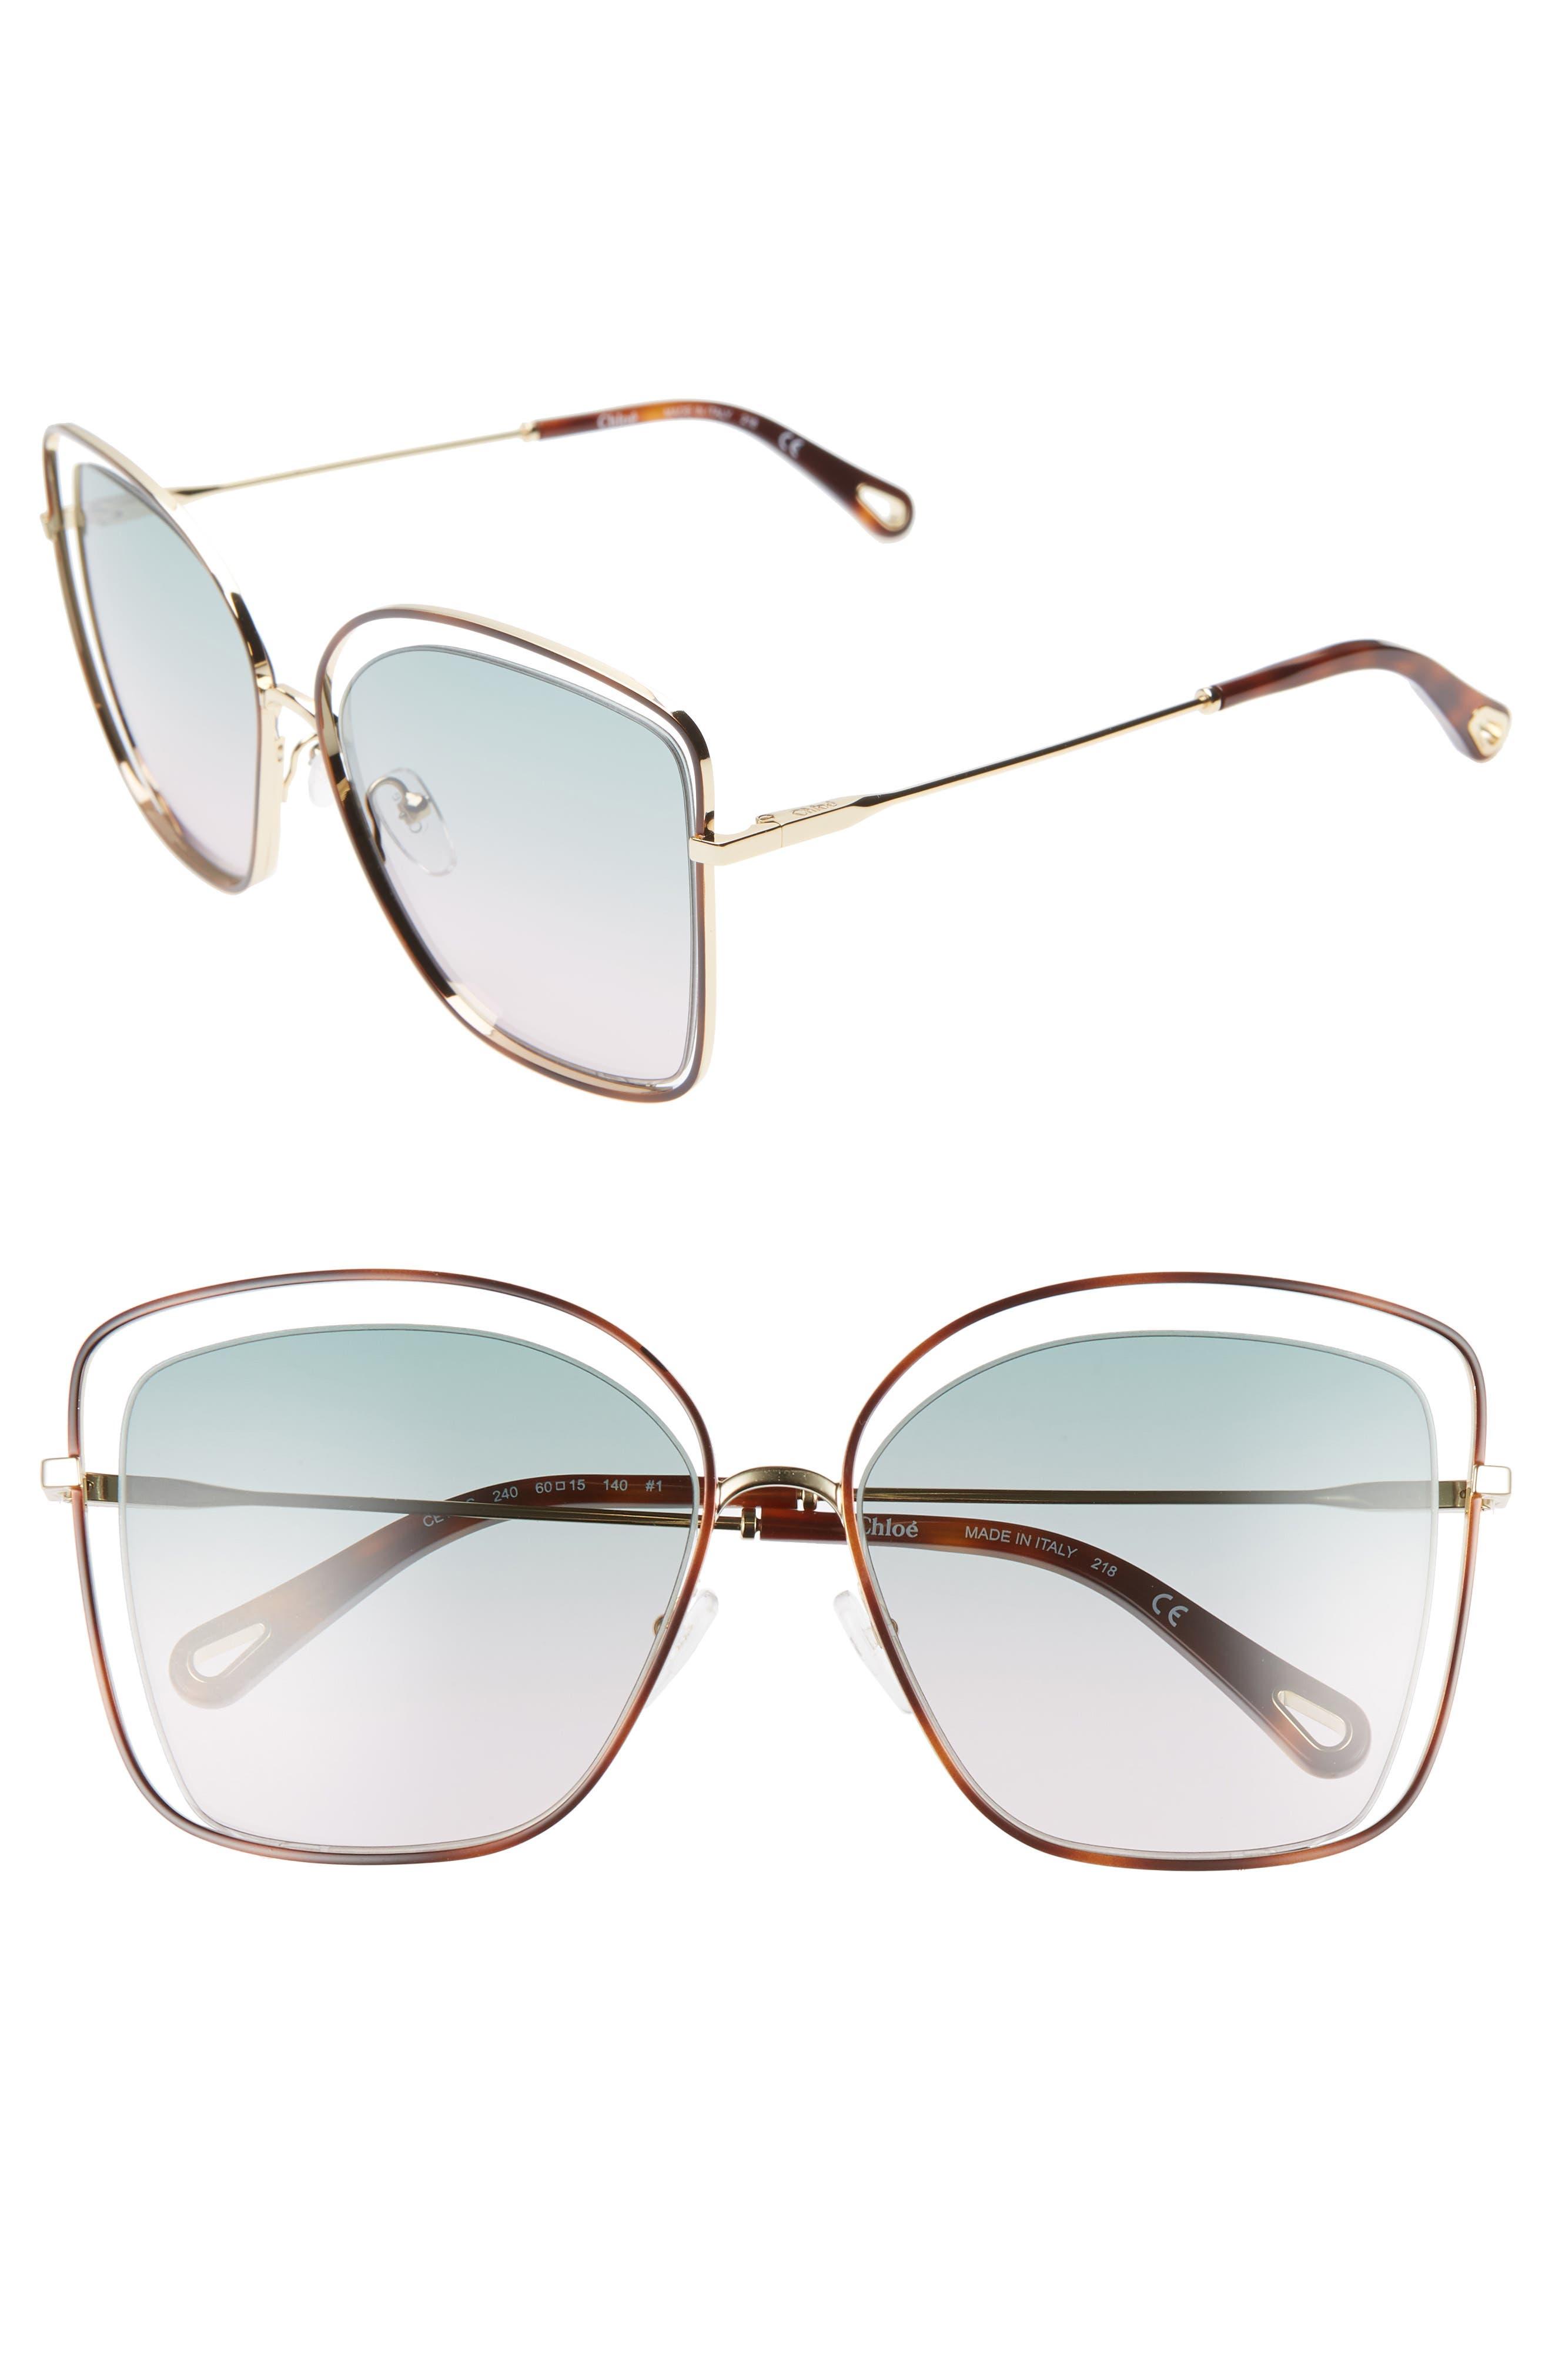 60mm Halo Frame Sunglasses,                             Main thumbnail 1, color,                             HAVANA/ GREEN ROSE